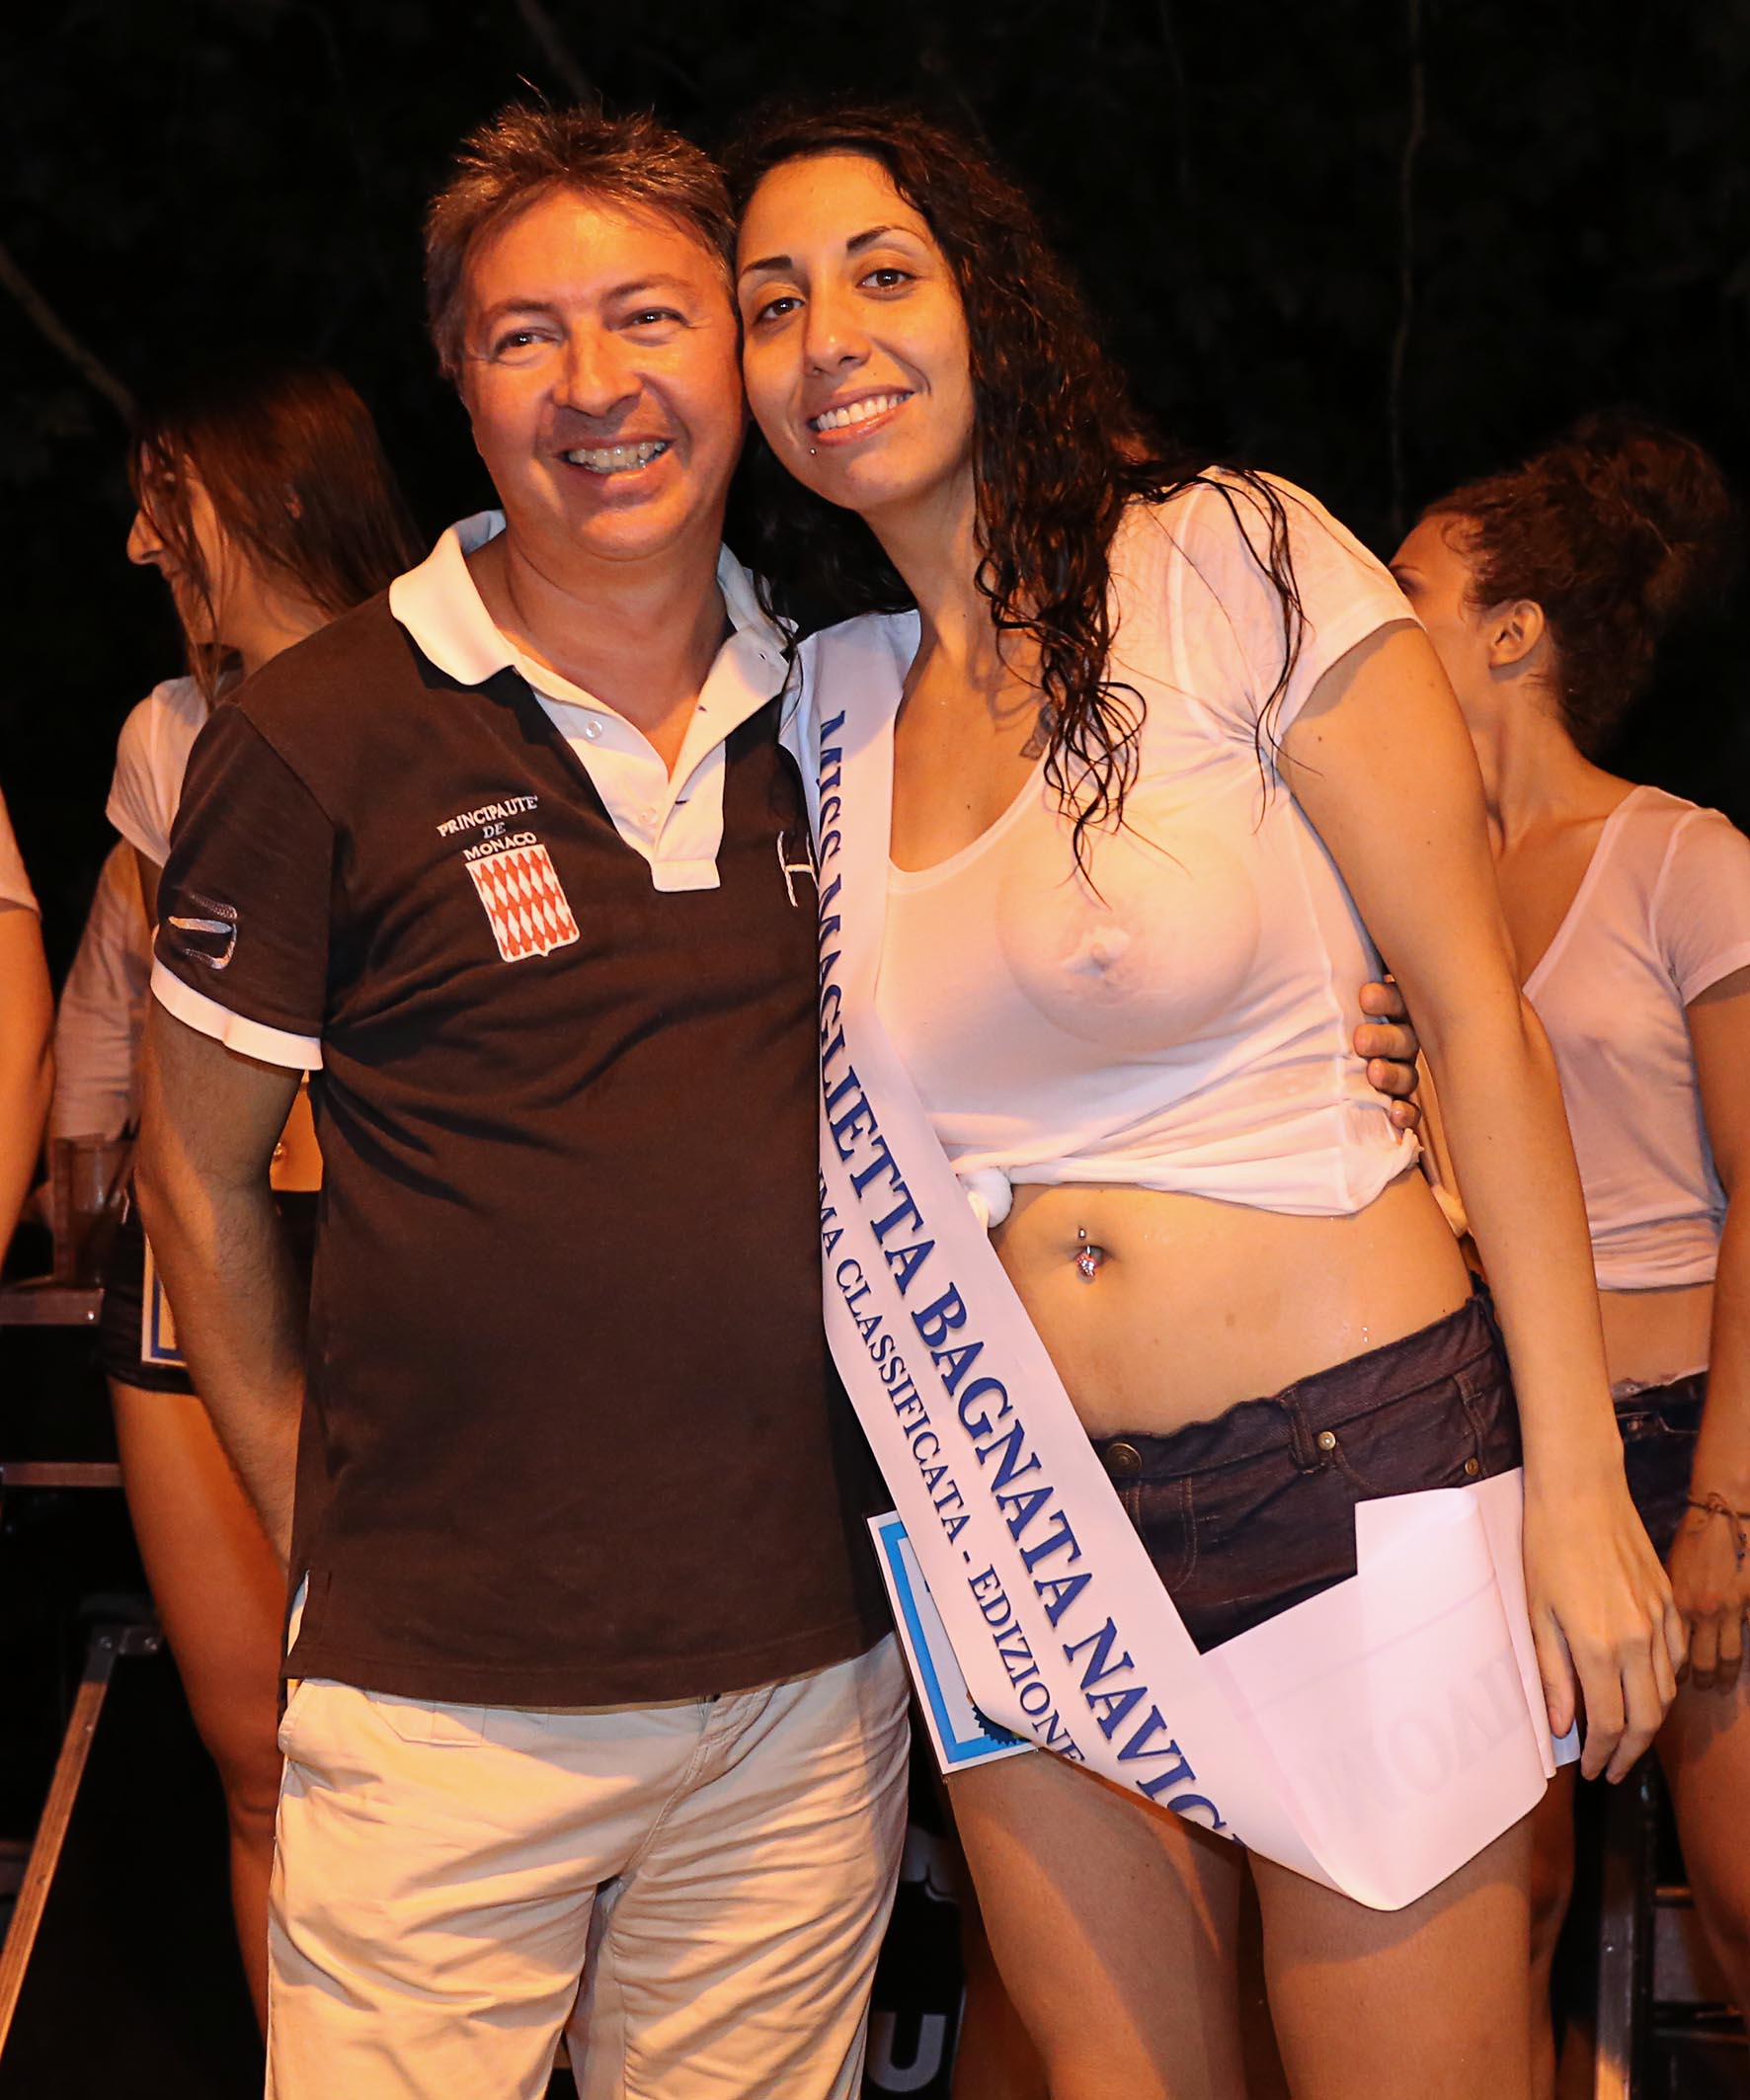 https://images2-corrieredelveneto.corriereobjects.it/methode_image/2018/07/19/Padova%20Rovigo/Foto%20Gallery/11067978.jpg